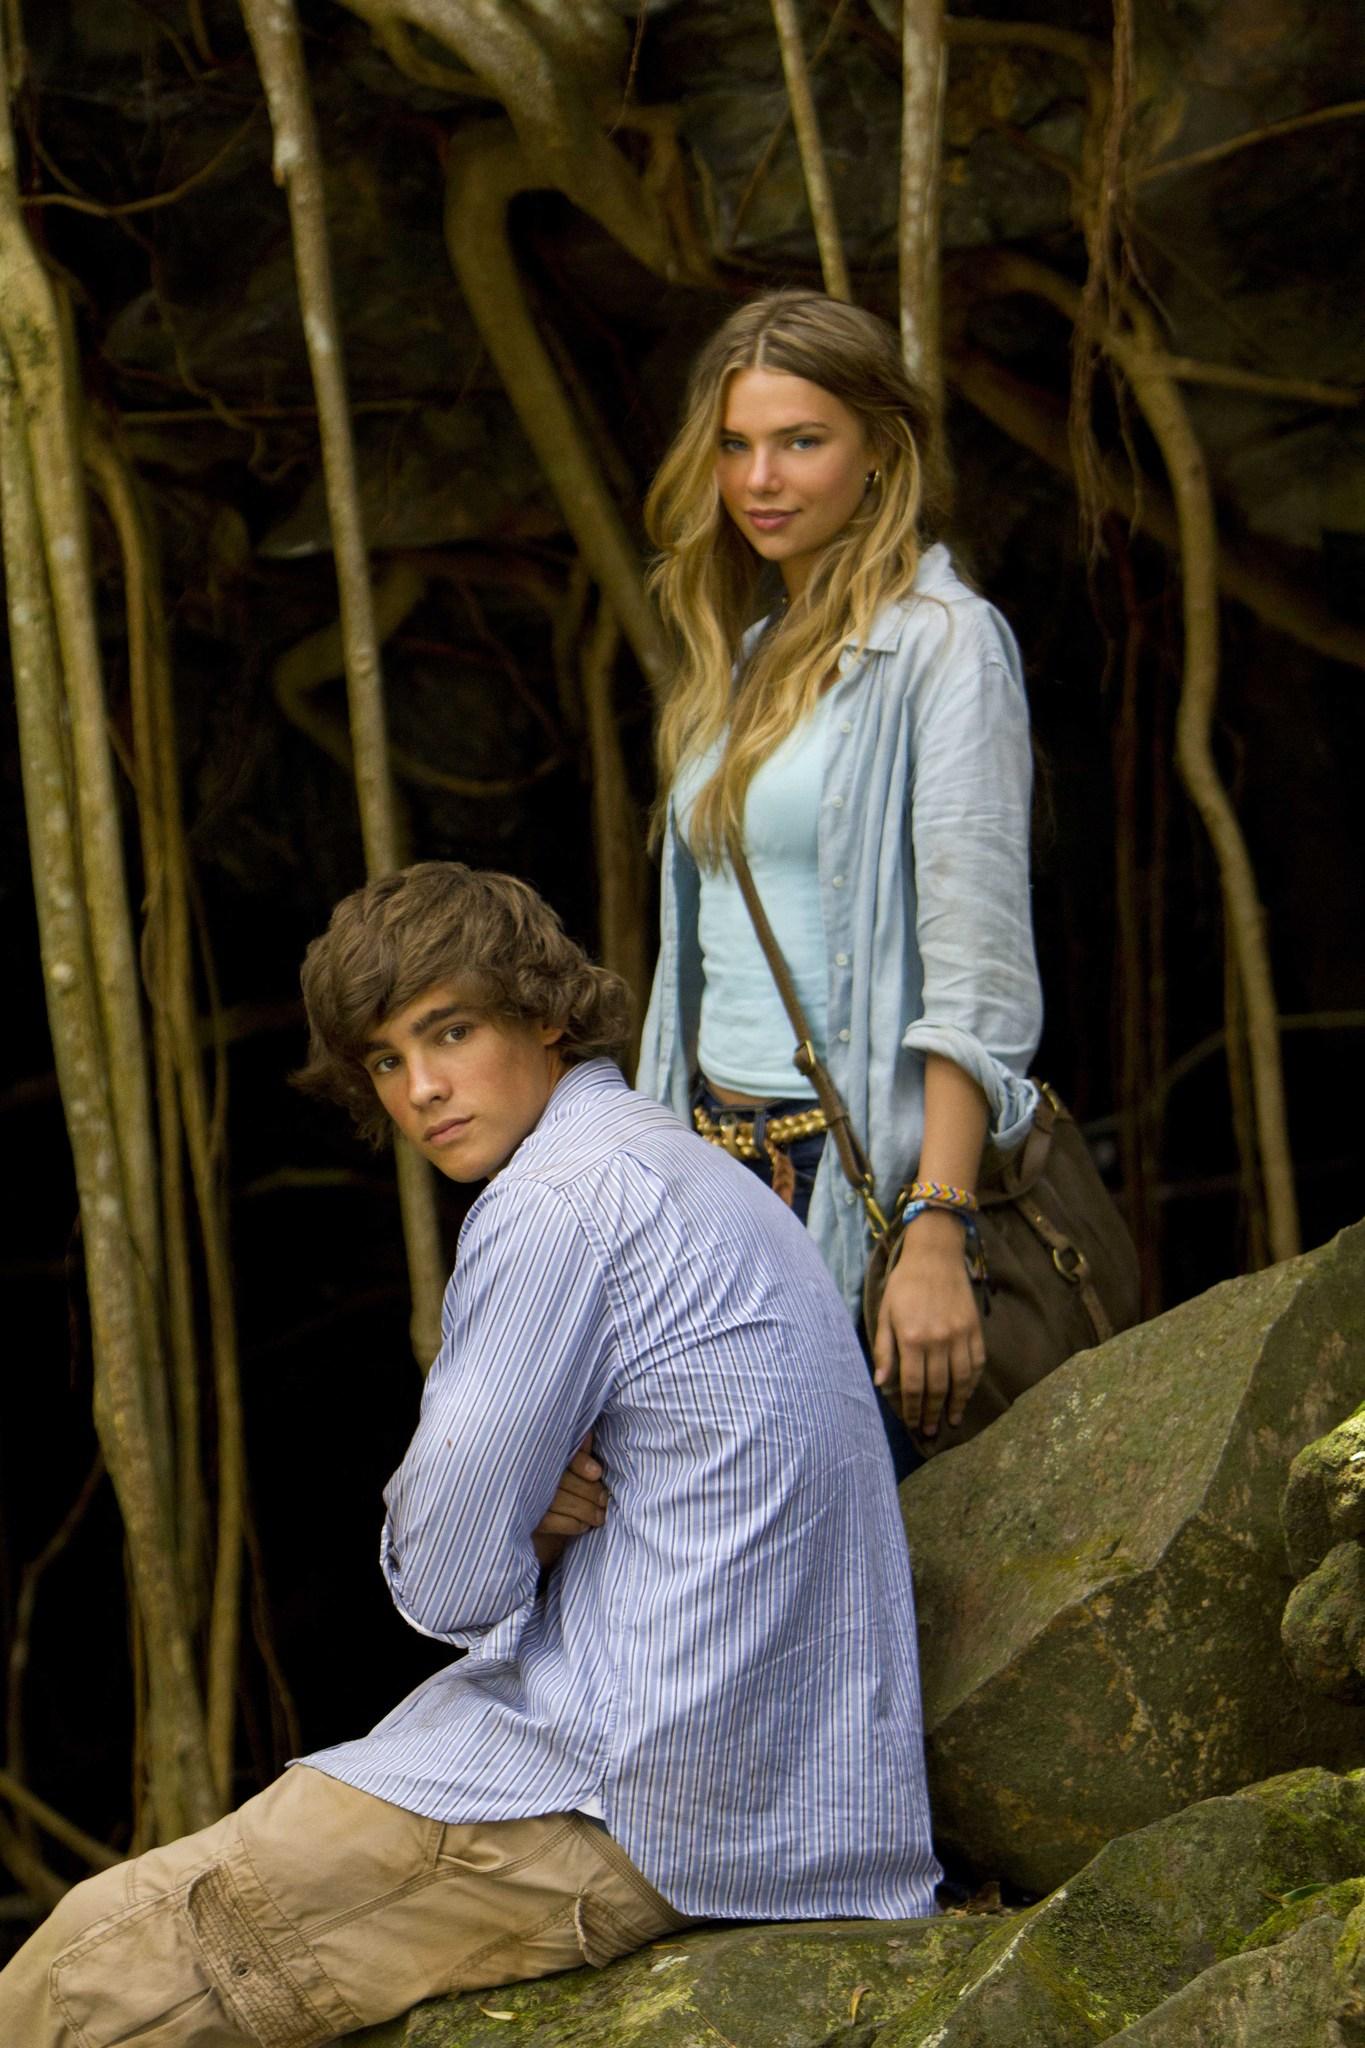 Blue Lagoon The Awakening Tv Movie 2012 Photo Gallery